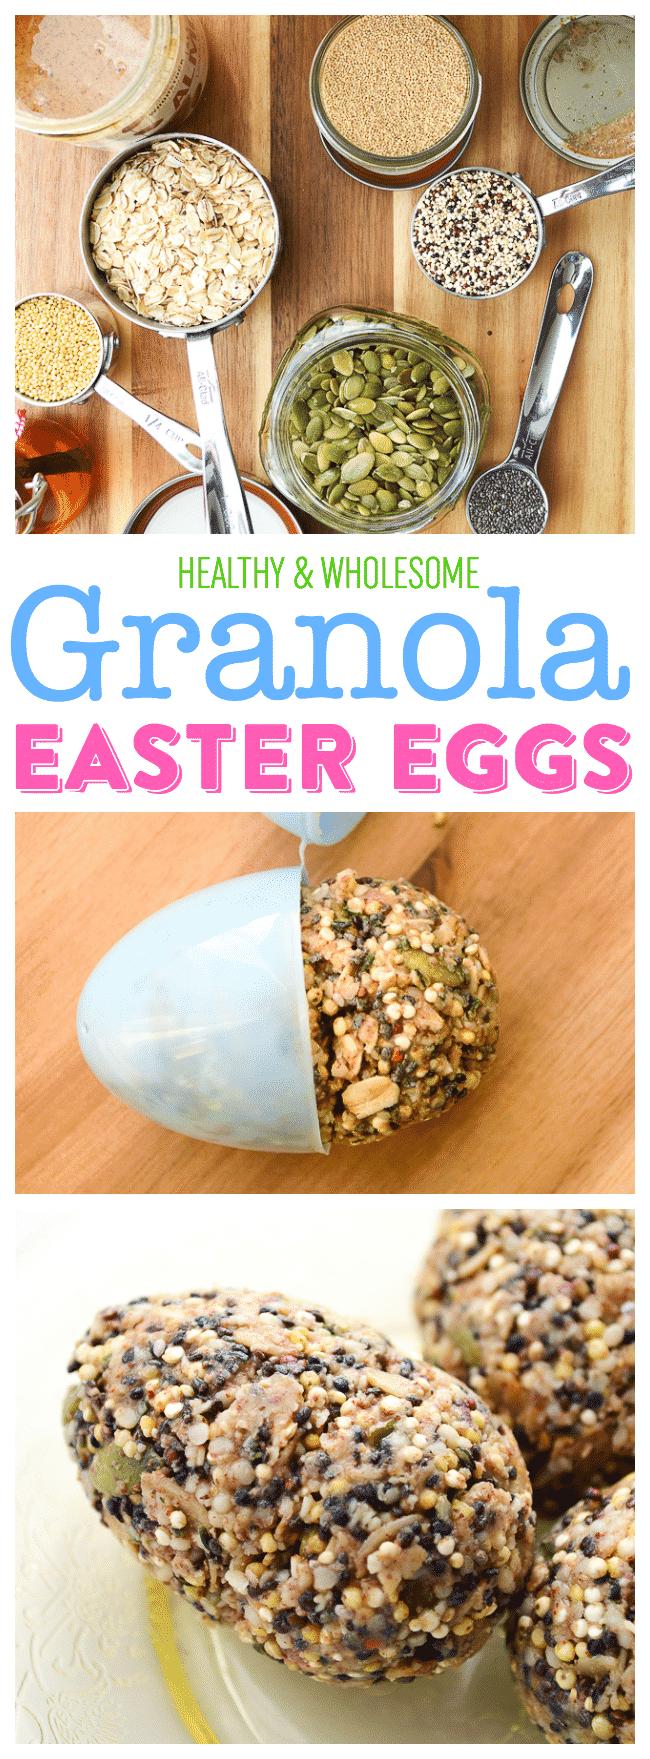 Healthy Granola Easter Eggs   Homemade Granola   Healthy Easter Treats for Kids   Easter Egg Molds